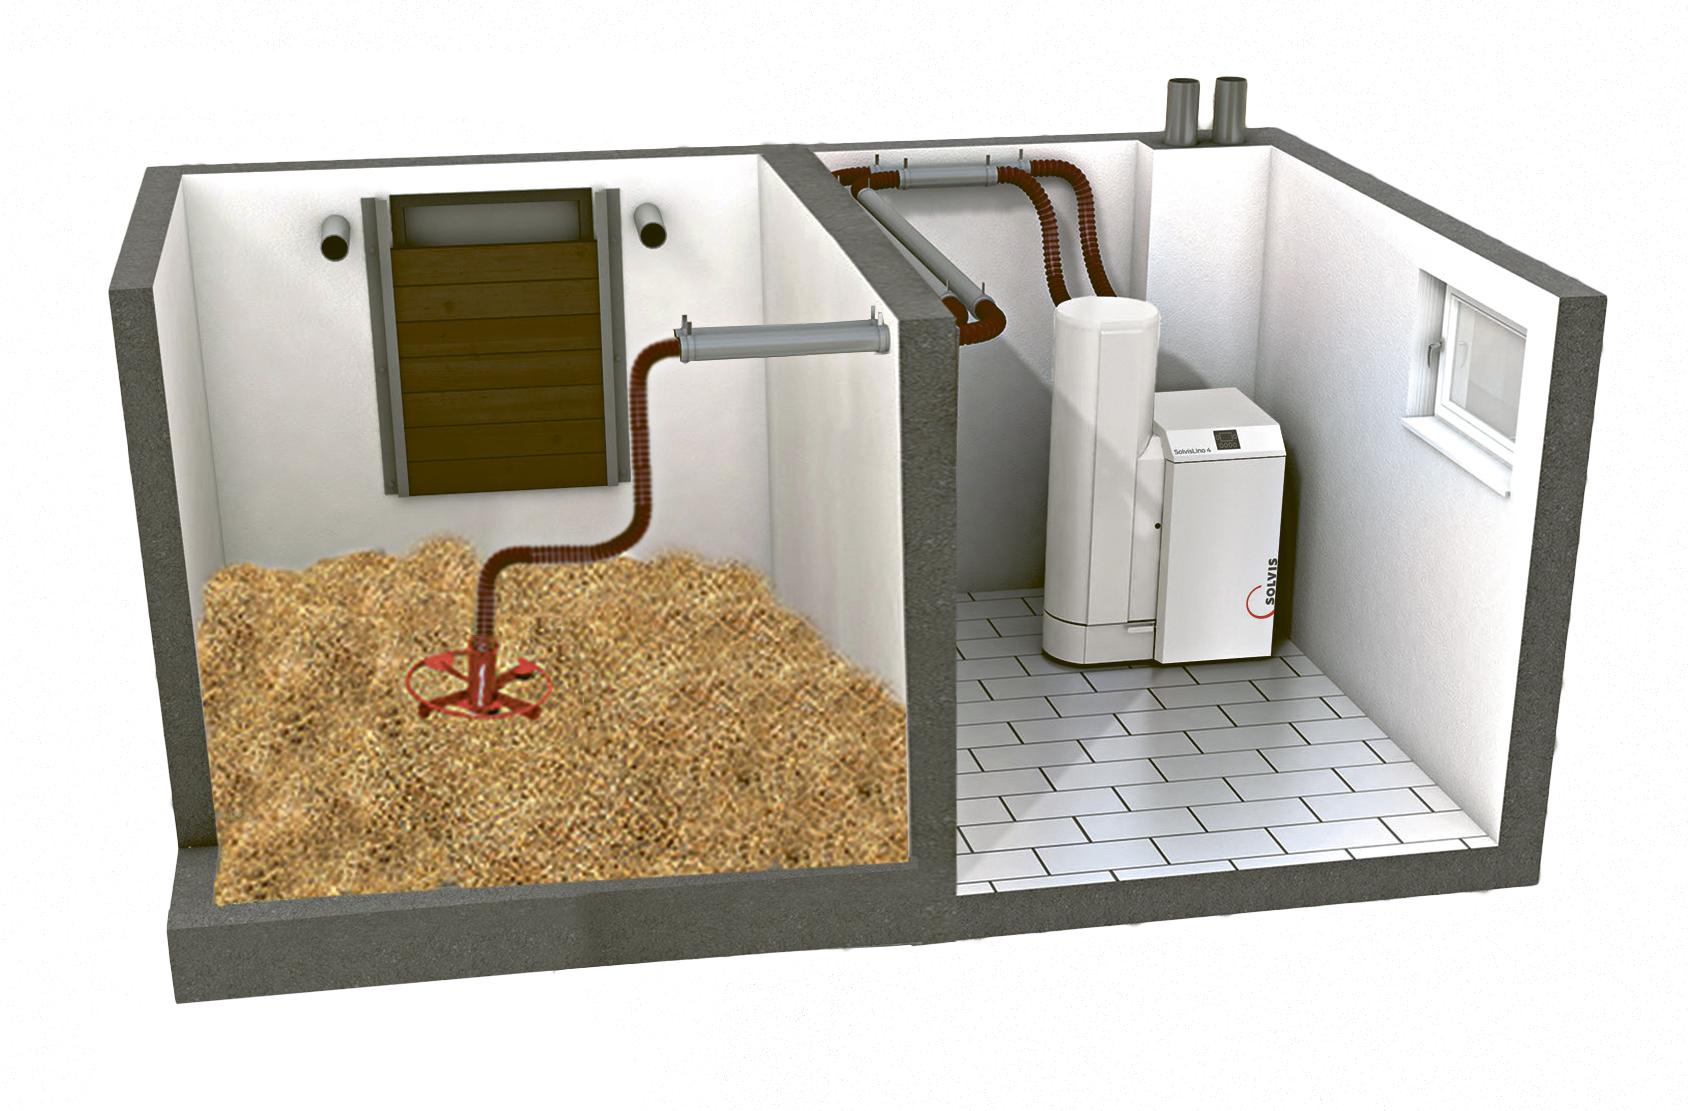 SolvisLino Pelletkessel Heizsystem Lagerraum mit Maulwurflager